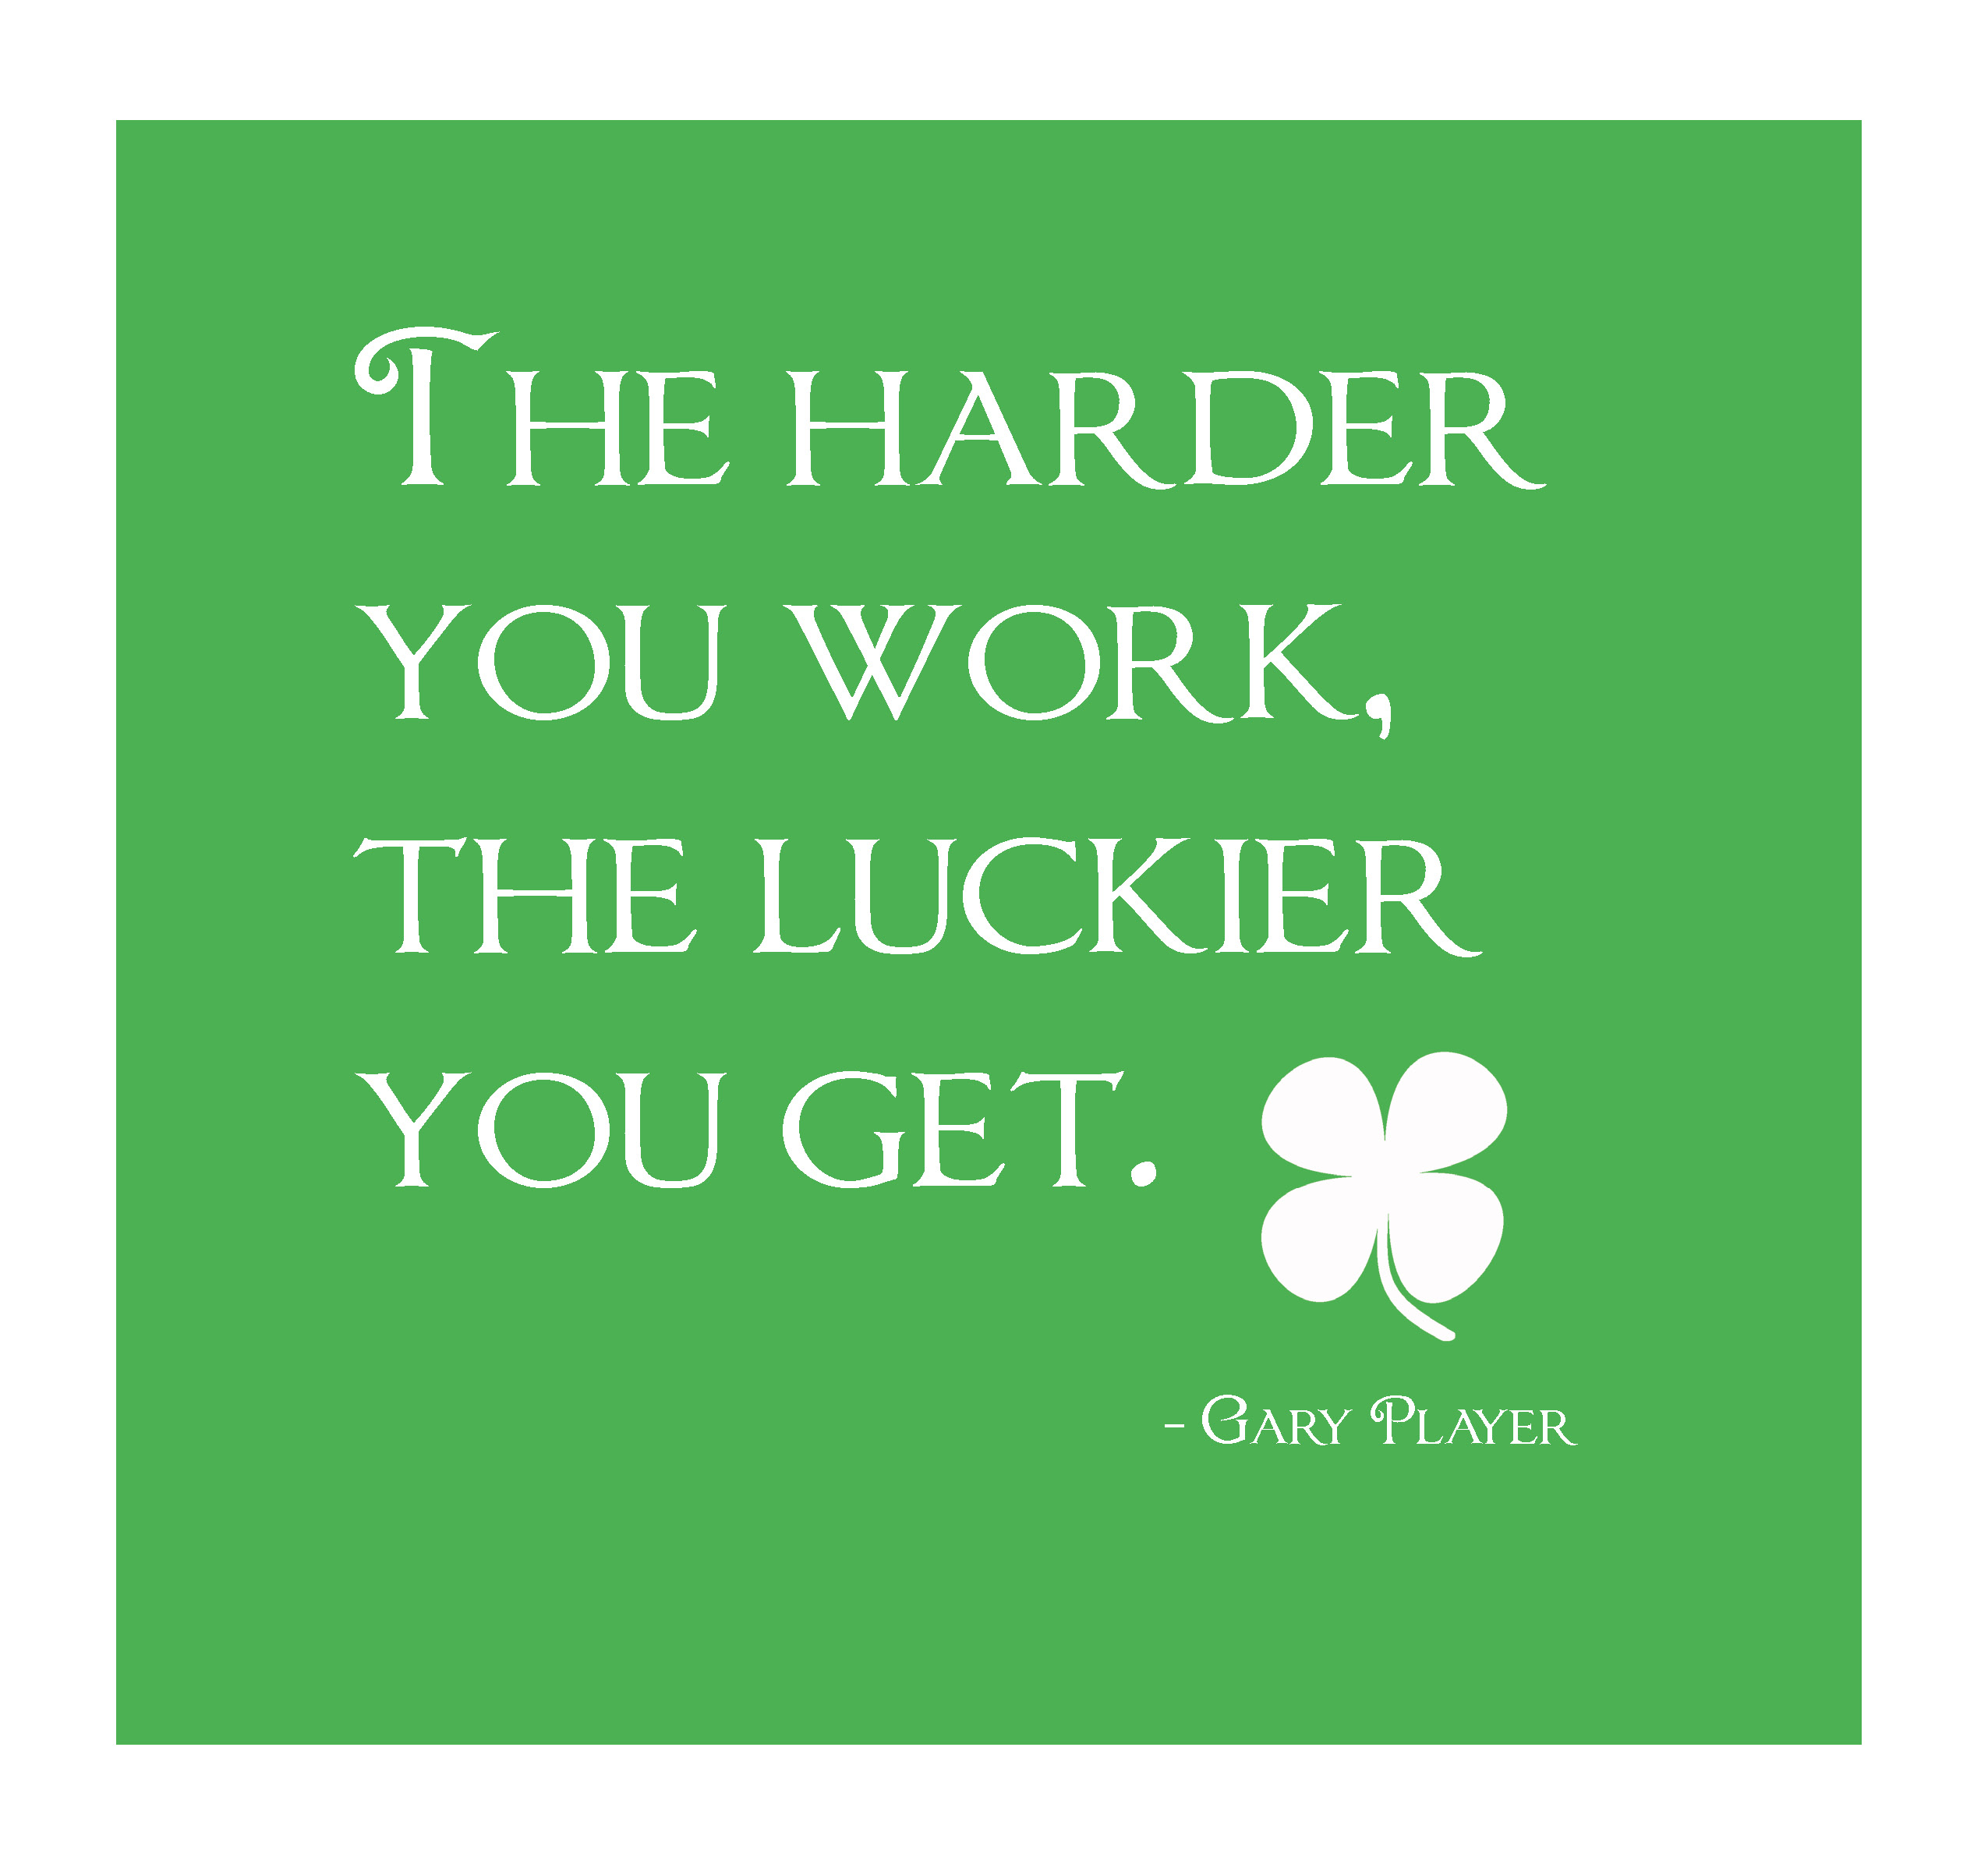 Inspirational Work Quotes Humorous Women. QuotesGram